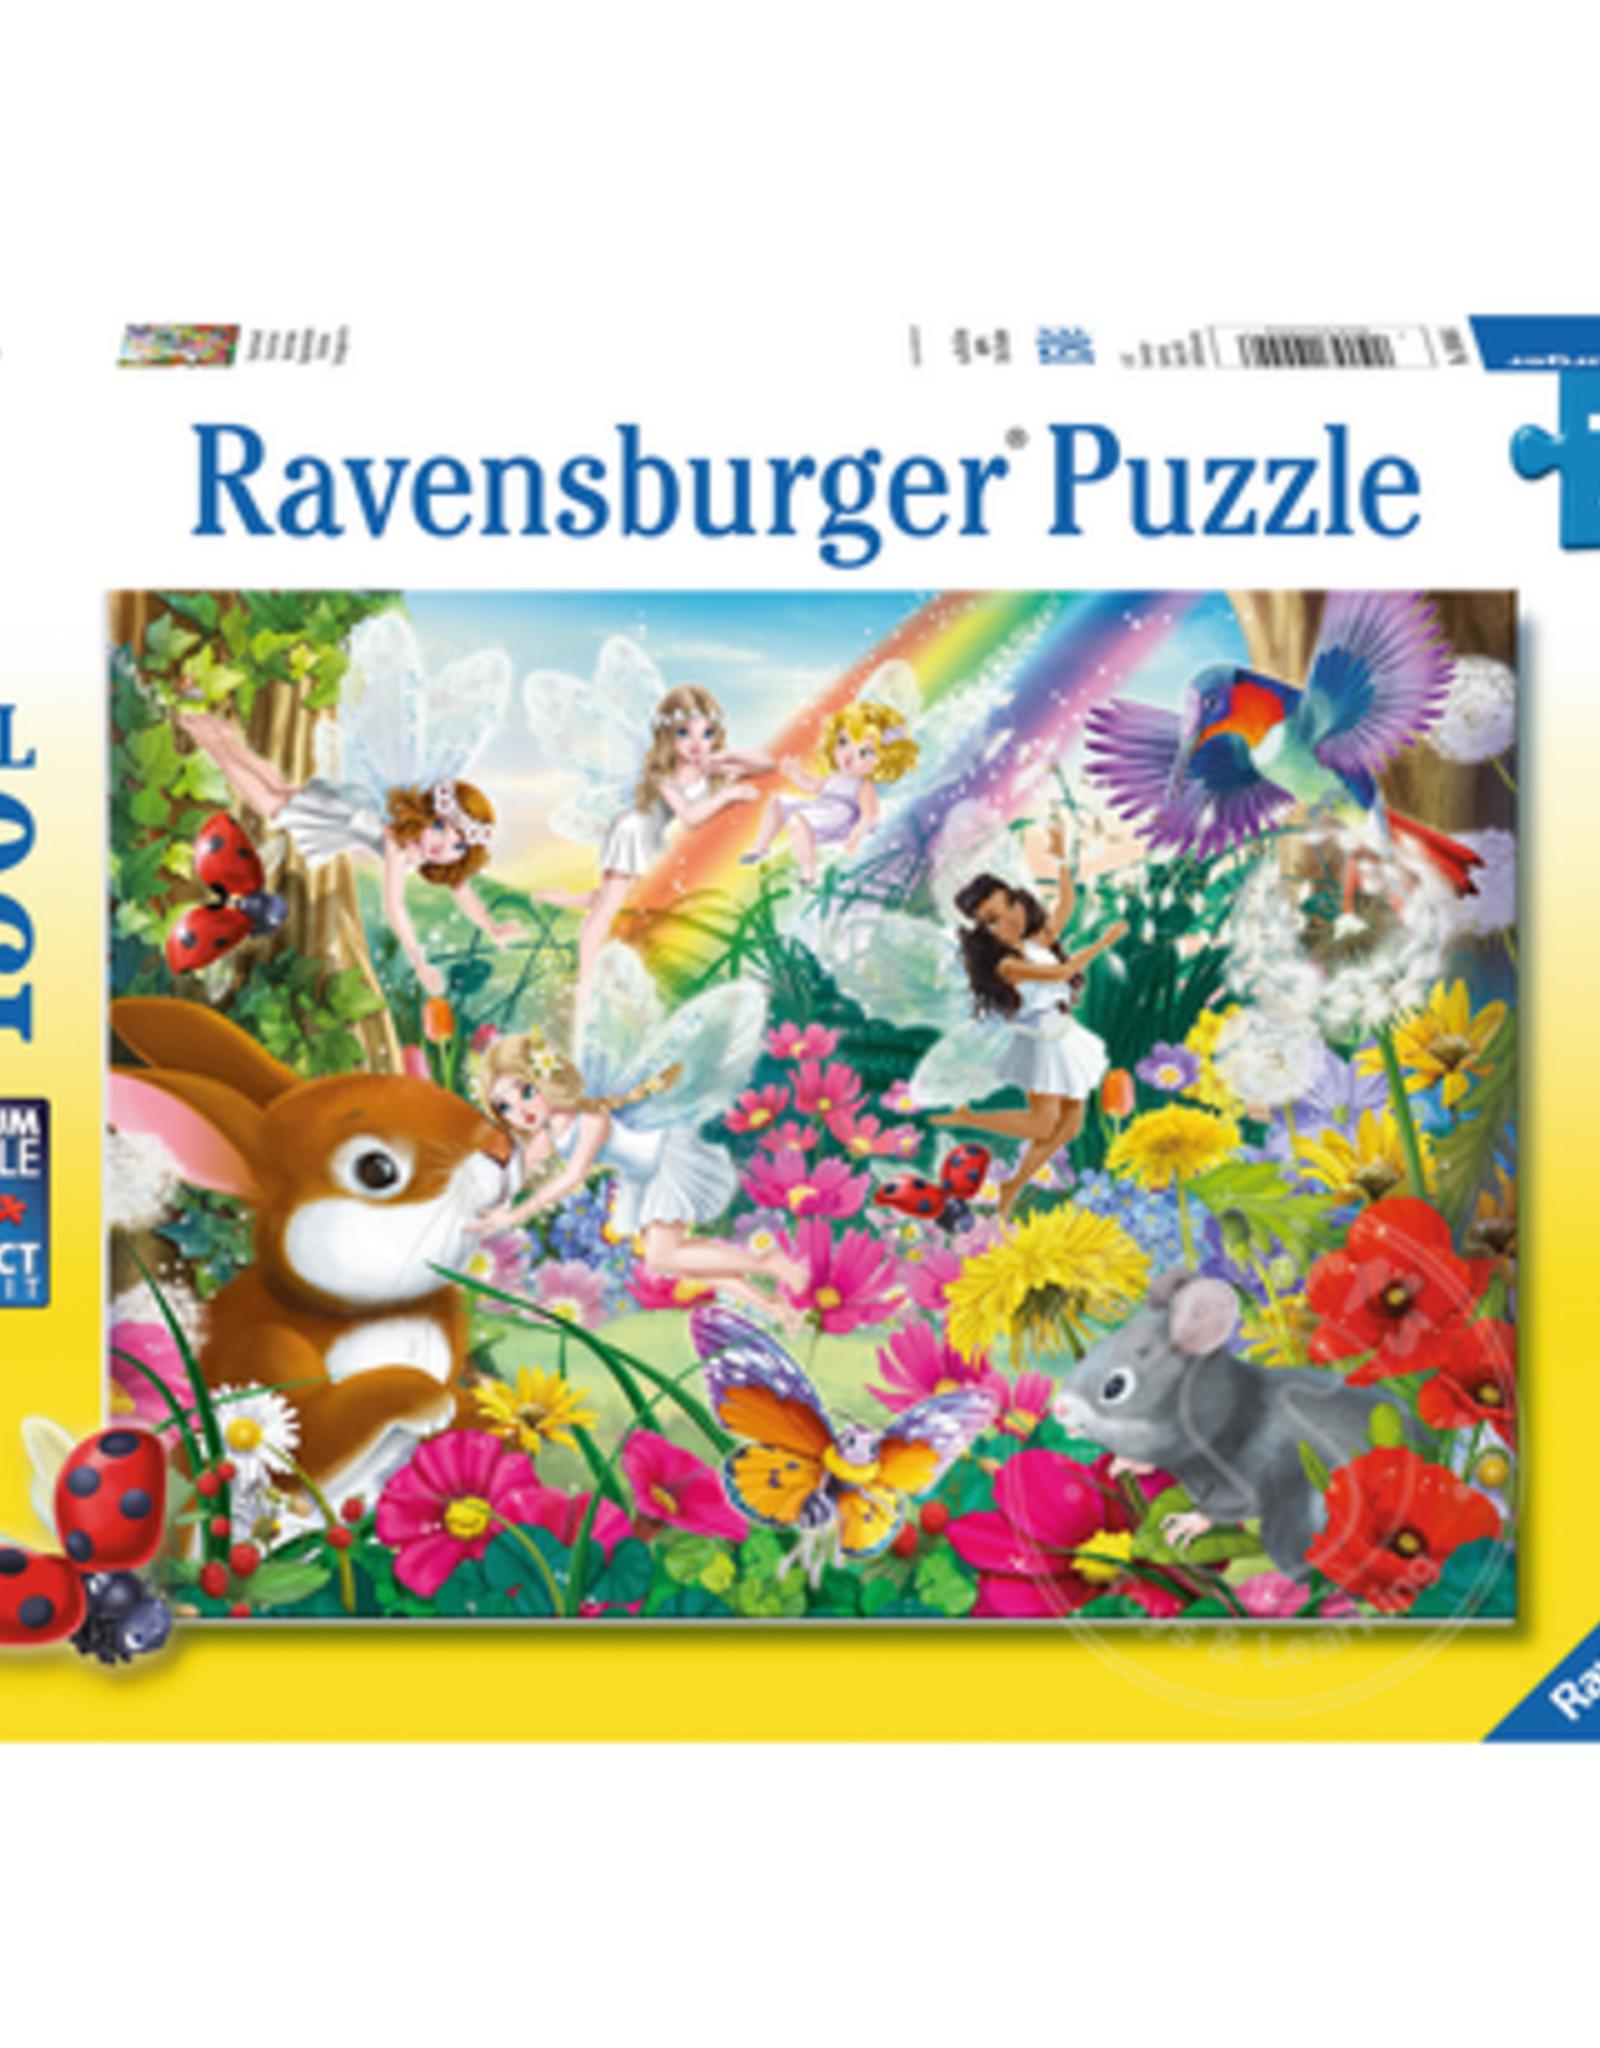 Ravensburger 150pc XXL puzzle Magical Forest Fairies